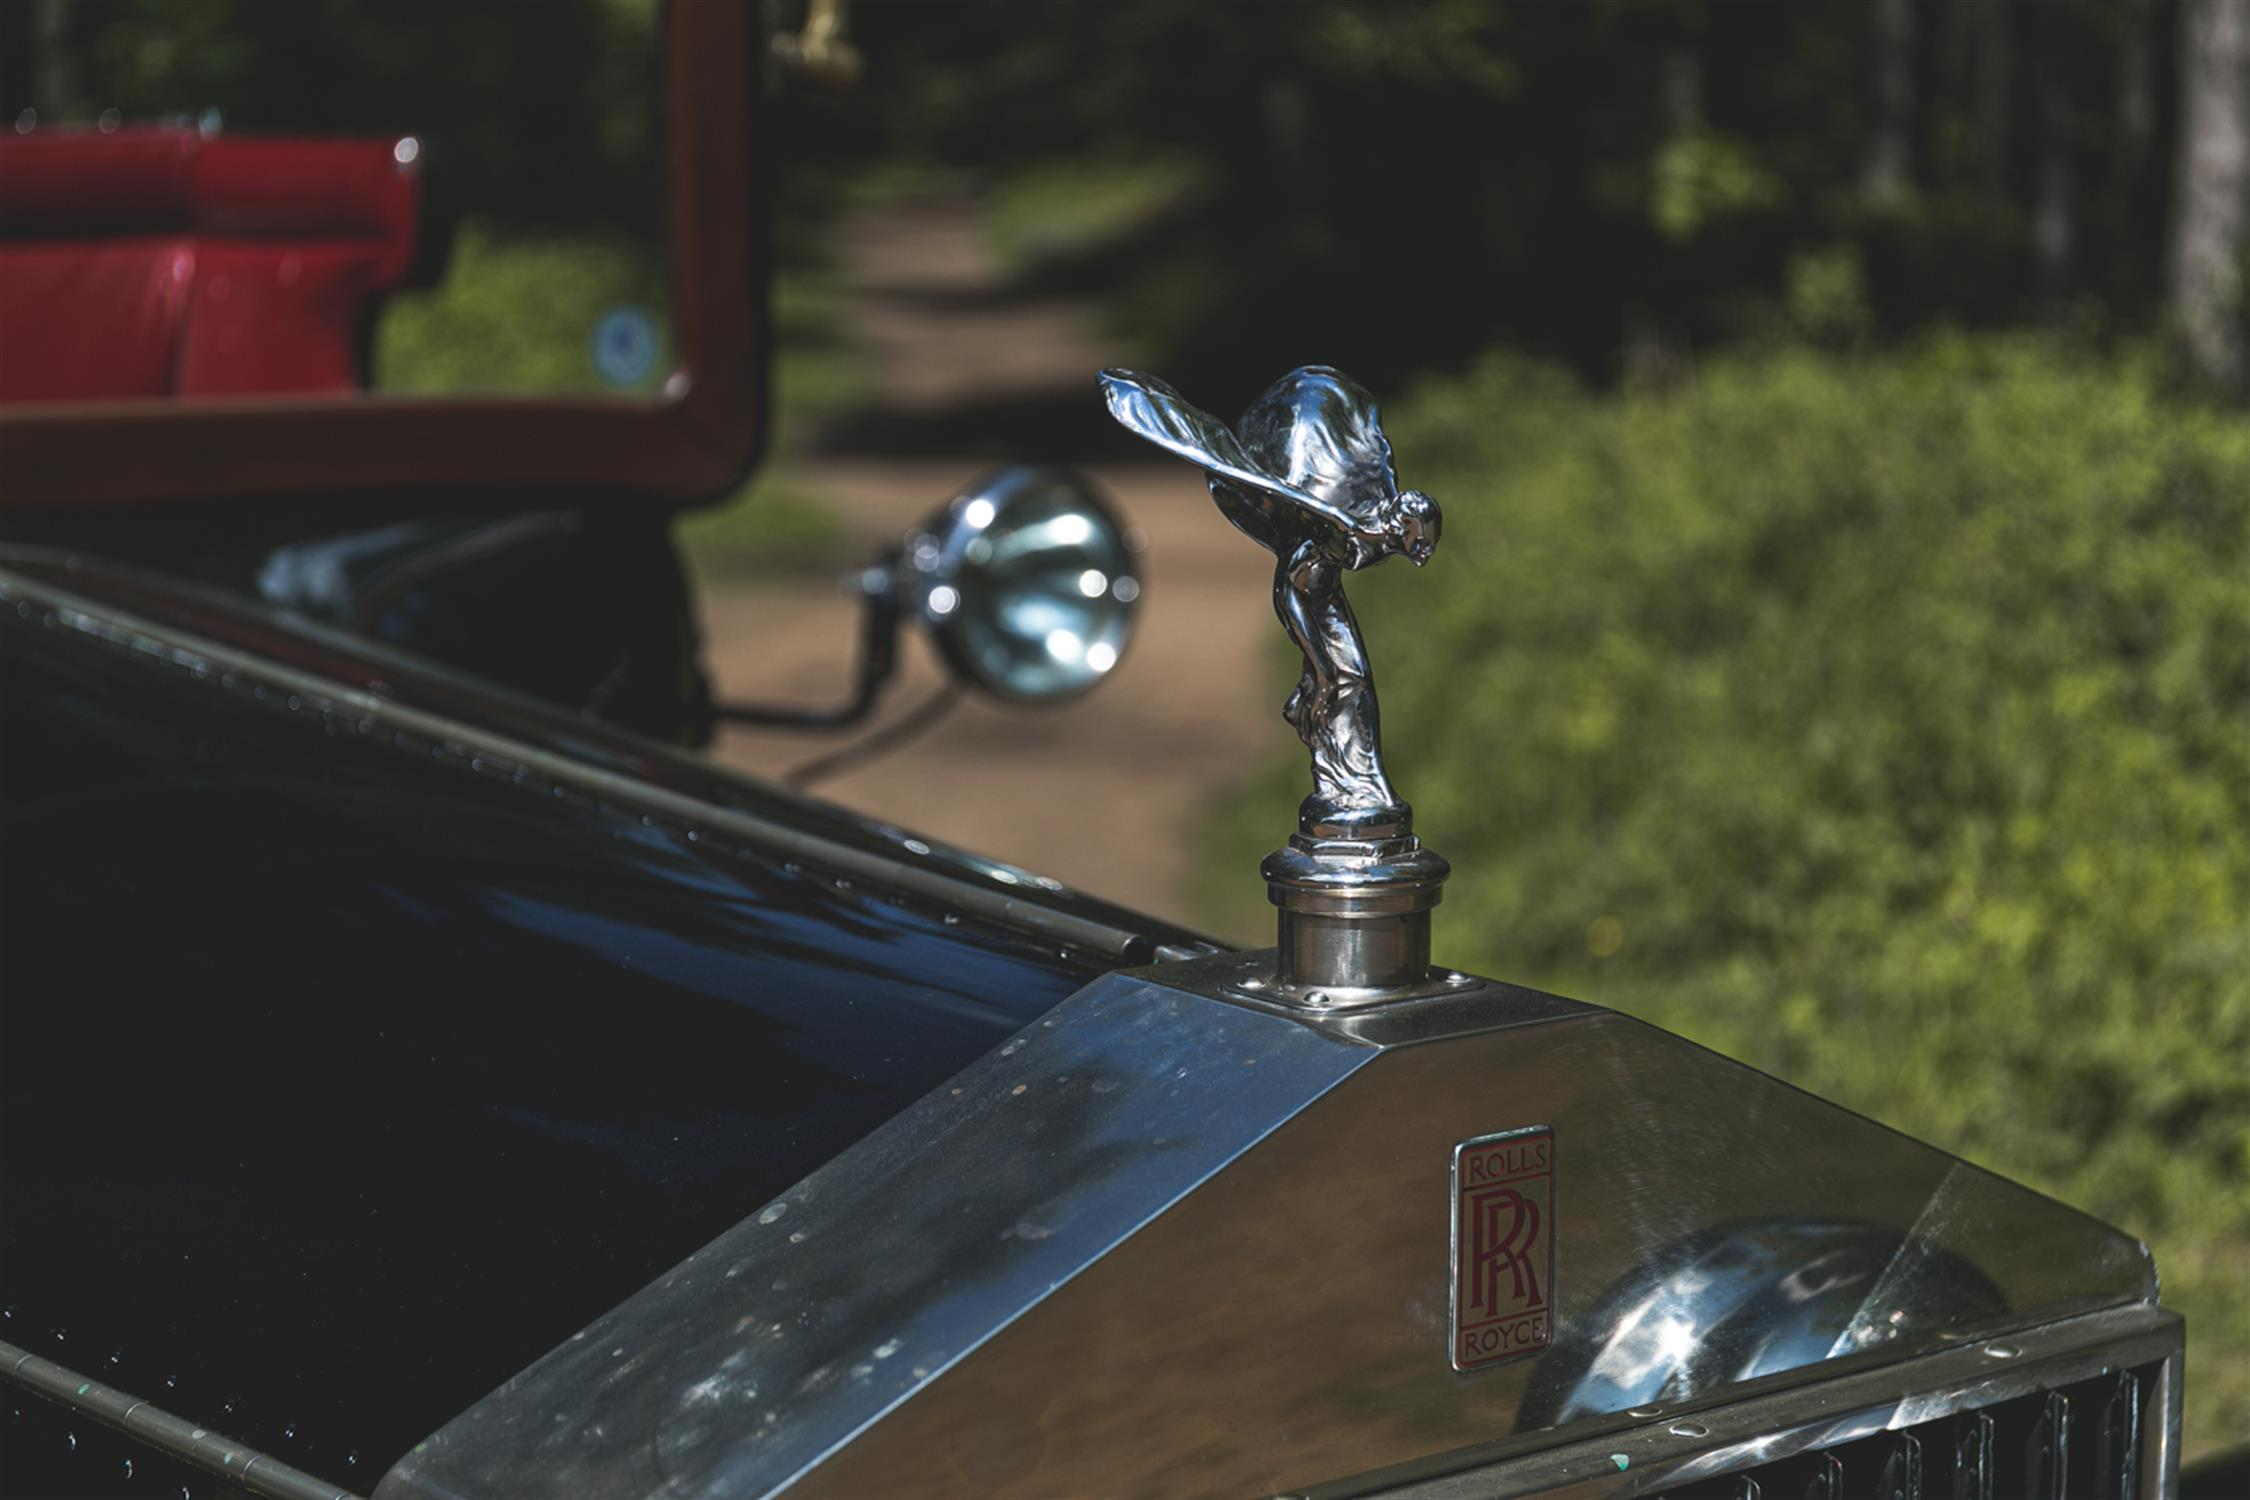 1927 Rolls-Royce Phantom 1 Open Tourer - Image 9 of 10